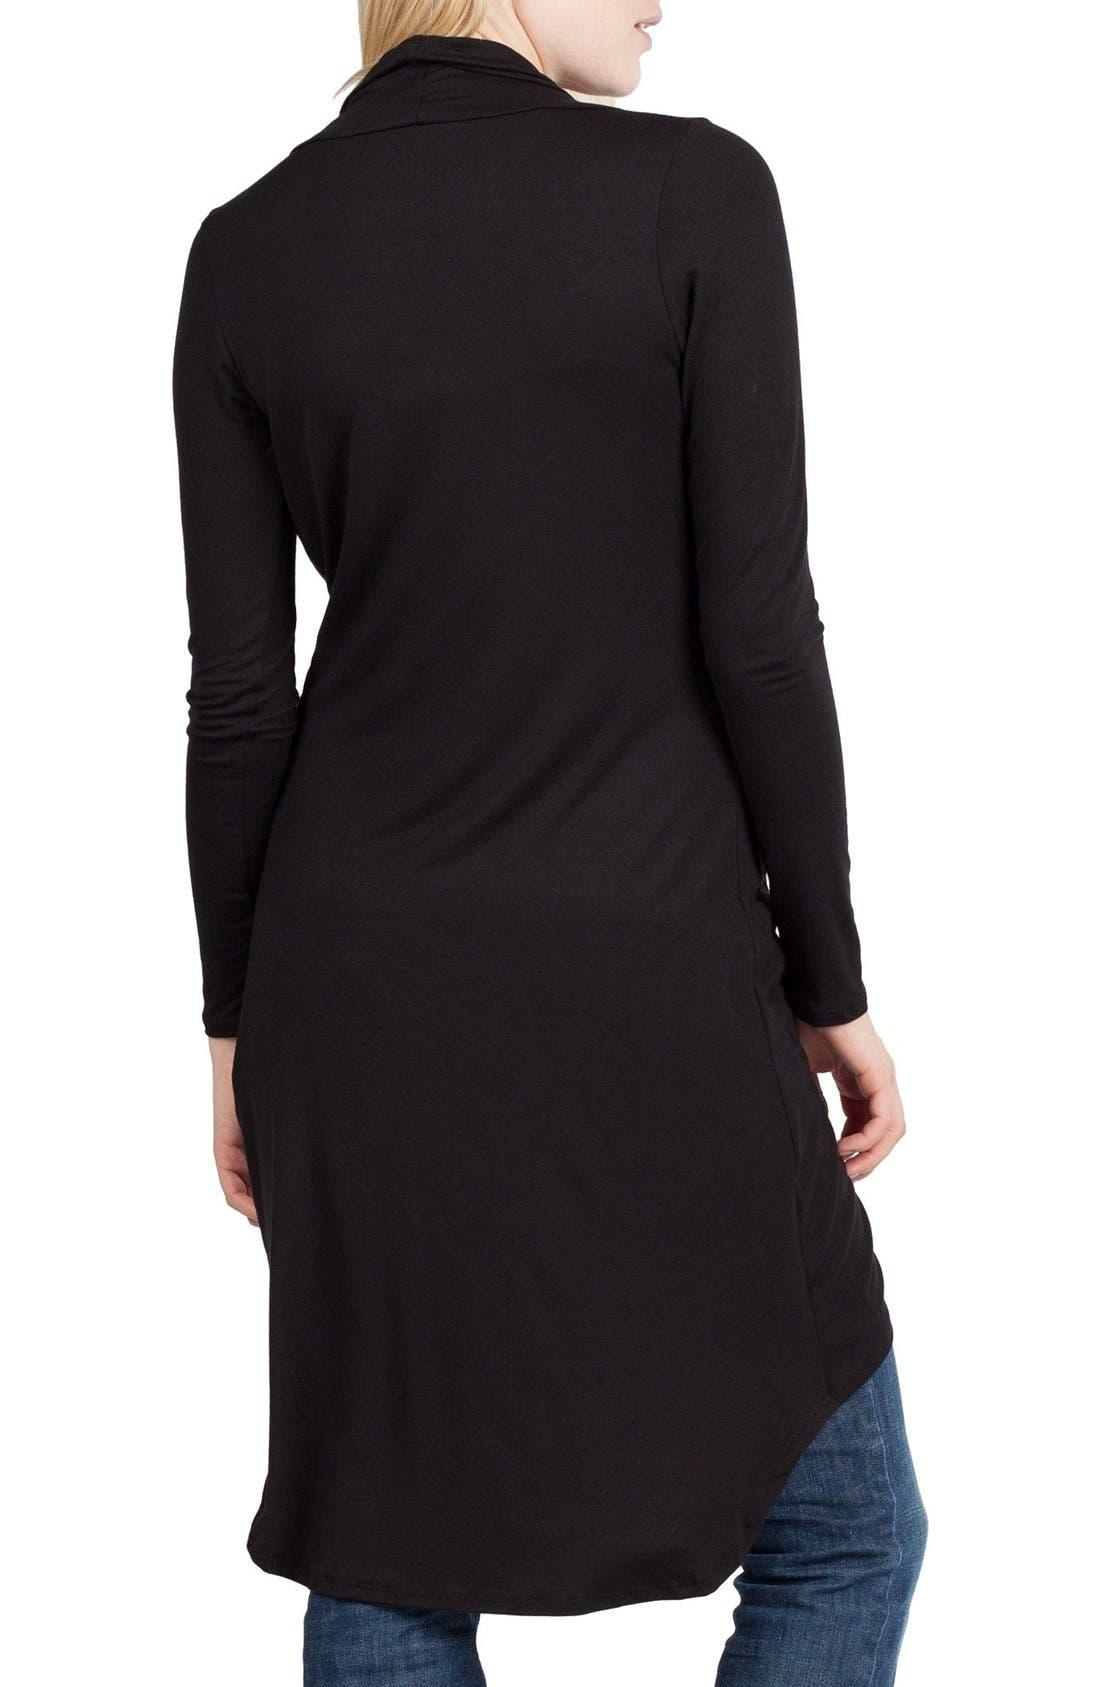 SAVI MOM, Nara Maternity/Nursing Cardigan, Alternate thumbnail 2, color, BLACK